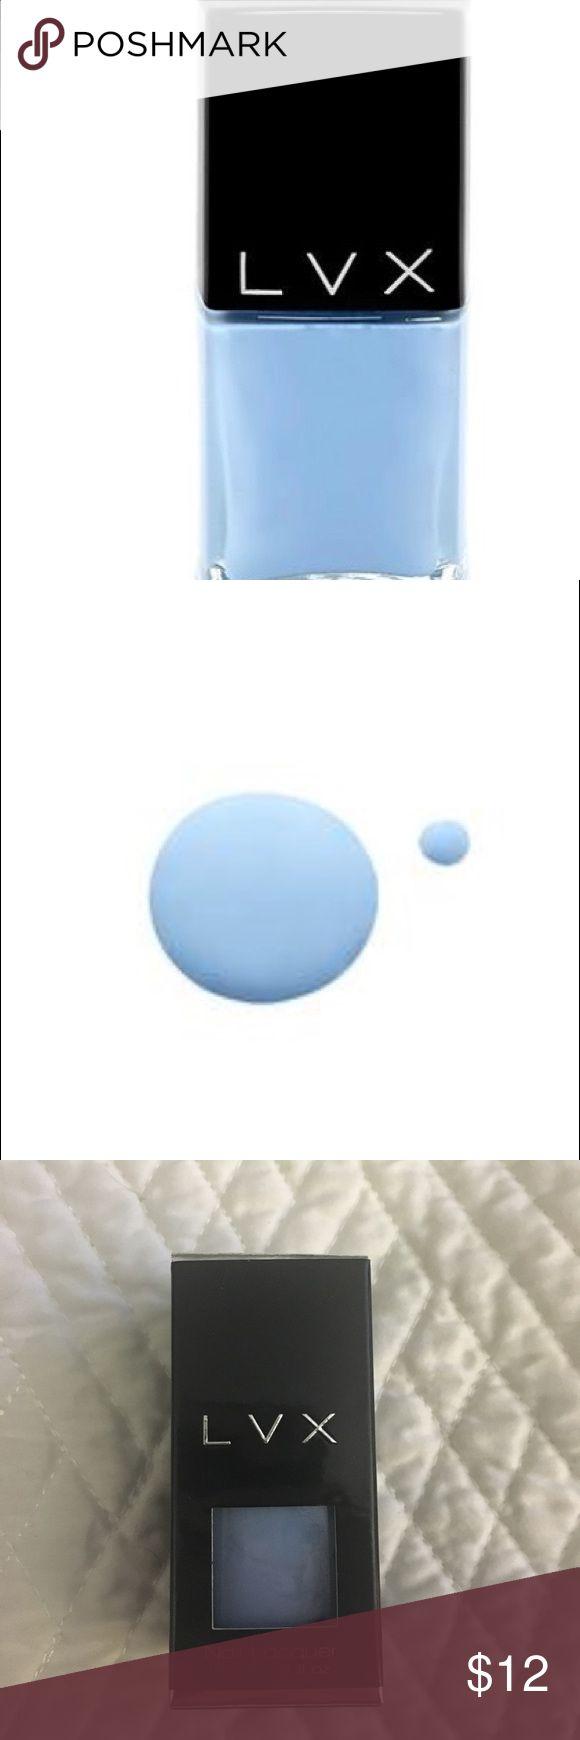 LVX nail polish Seren Color Description: Whimsical Sky Blue   Original Release: Summer 2016  Inspiration: Emilio Pucci - Anna Sui - Atelier Versace - Antonio Berardi LVX Makeup